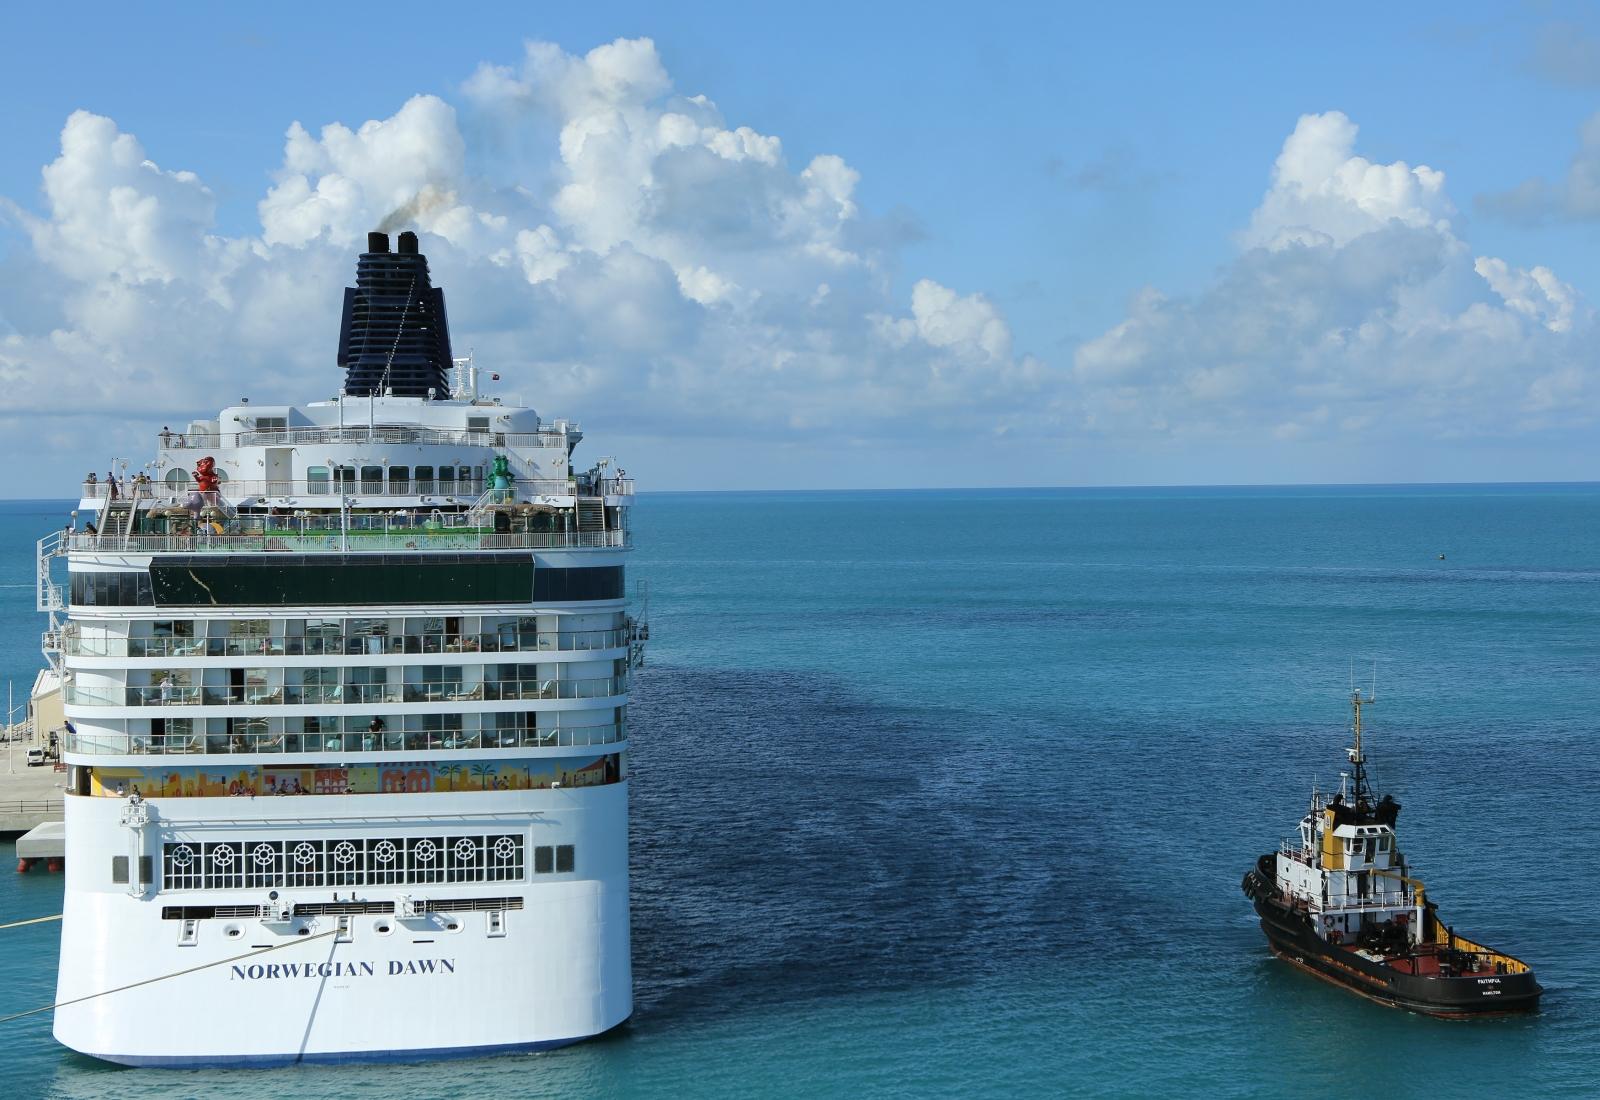 Norwegian Cruise Liner